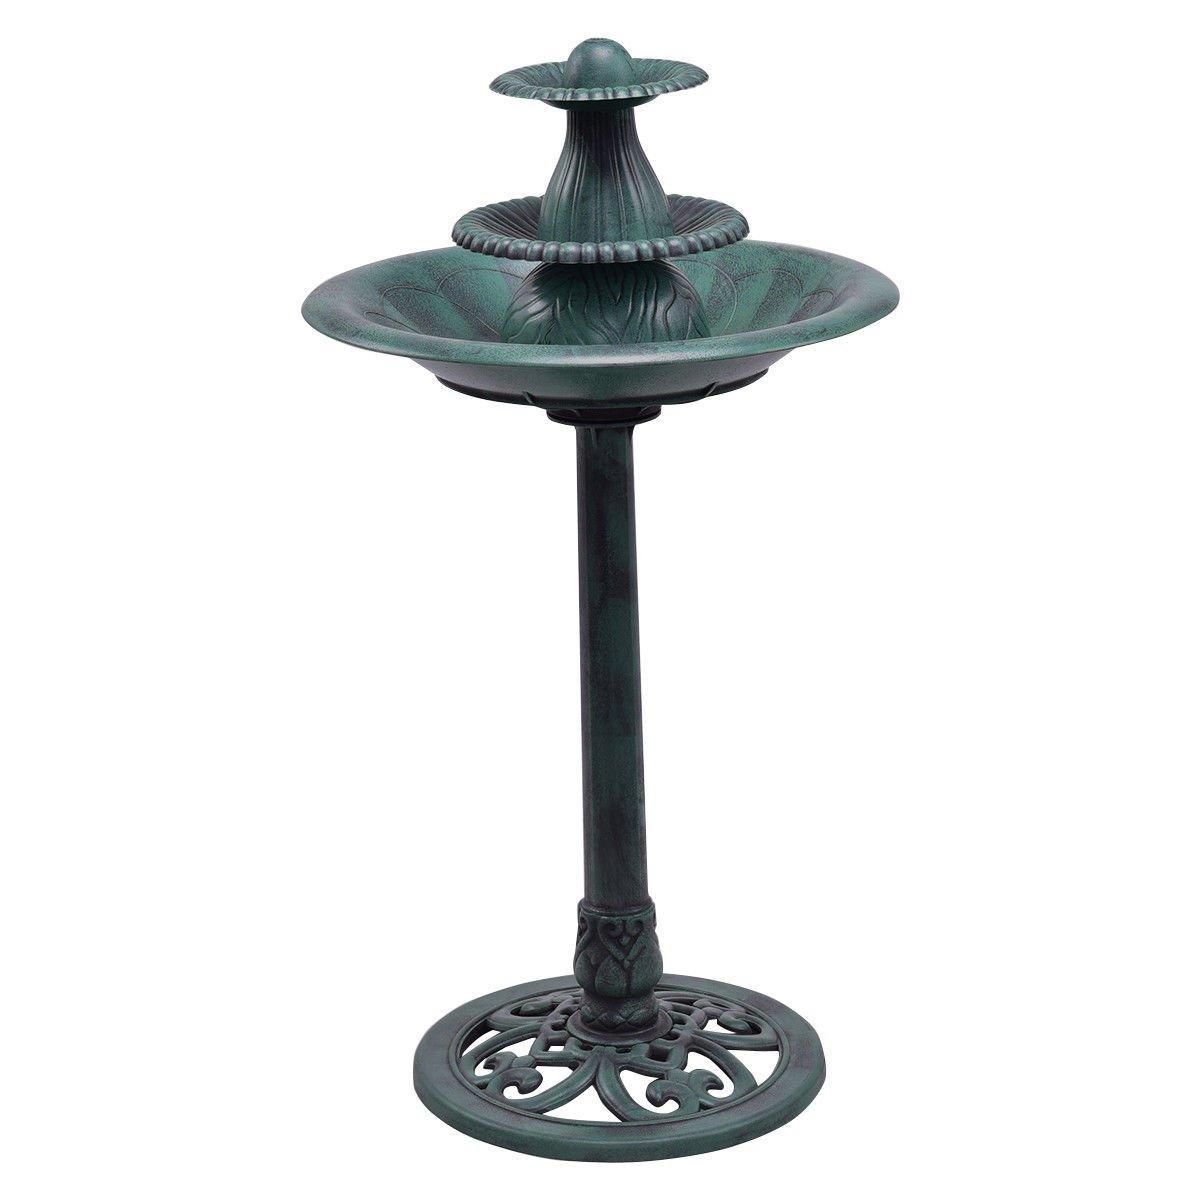 FDInspiration Antique Verdigris Finish 3 Tier Fountain Bird Bath Pedestal Garden Decor w/Pump Recirculation System